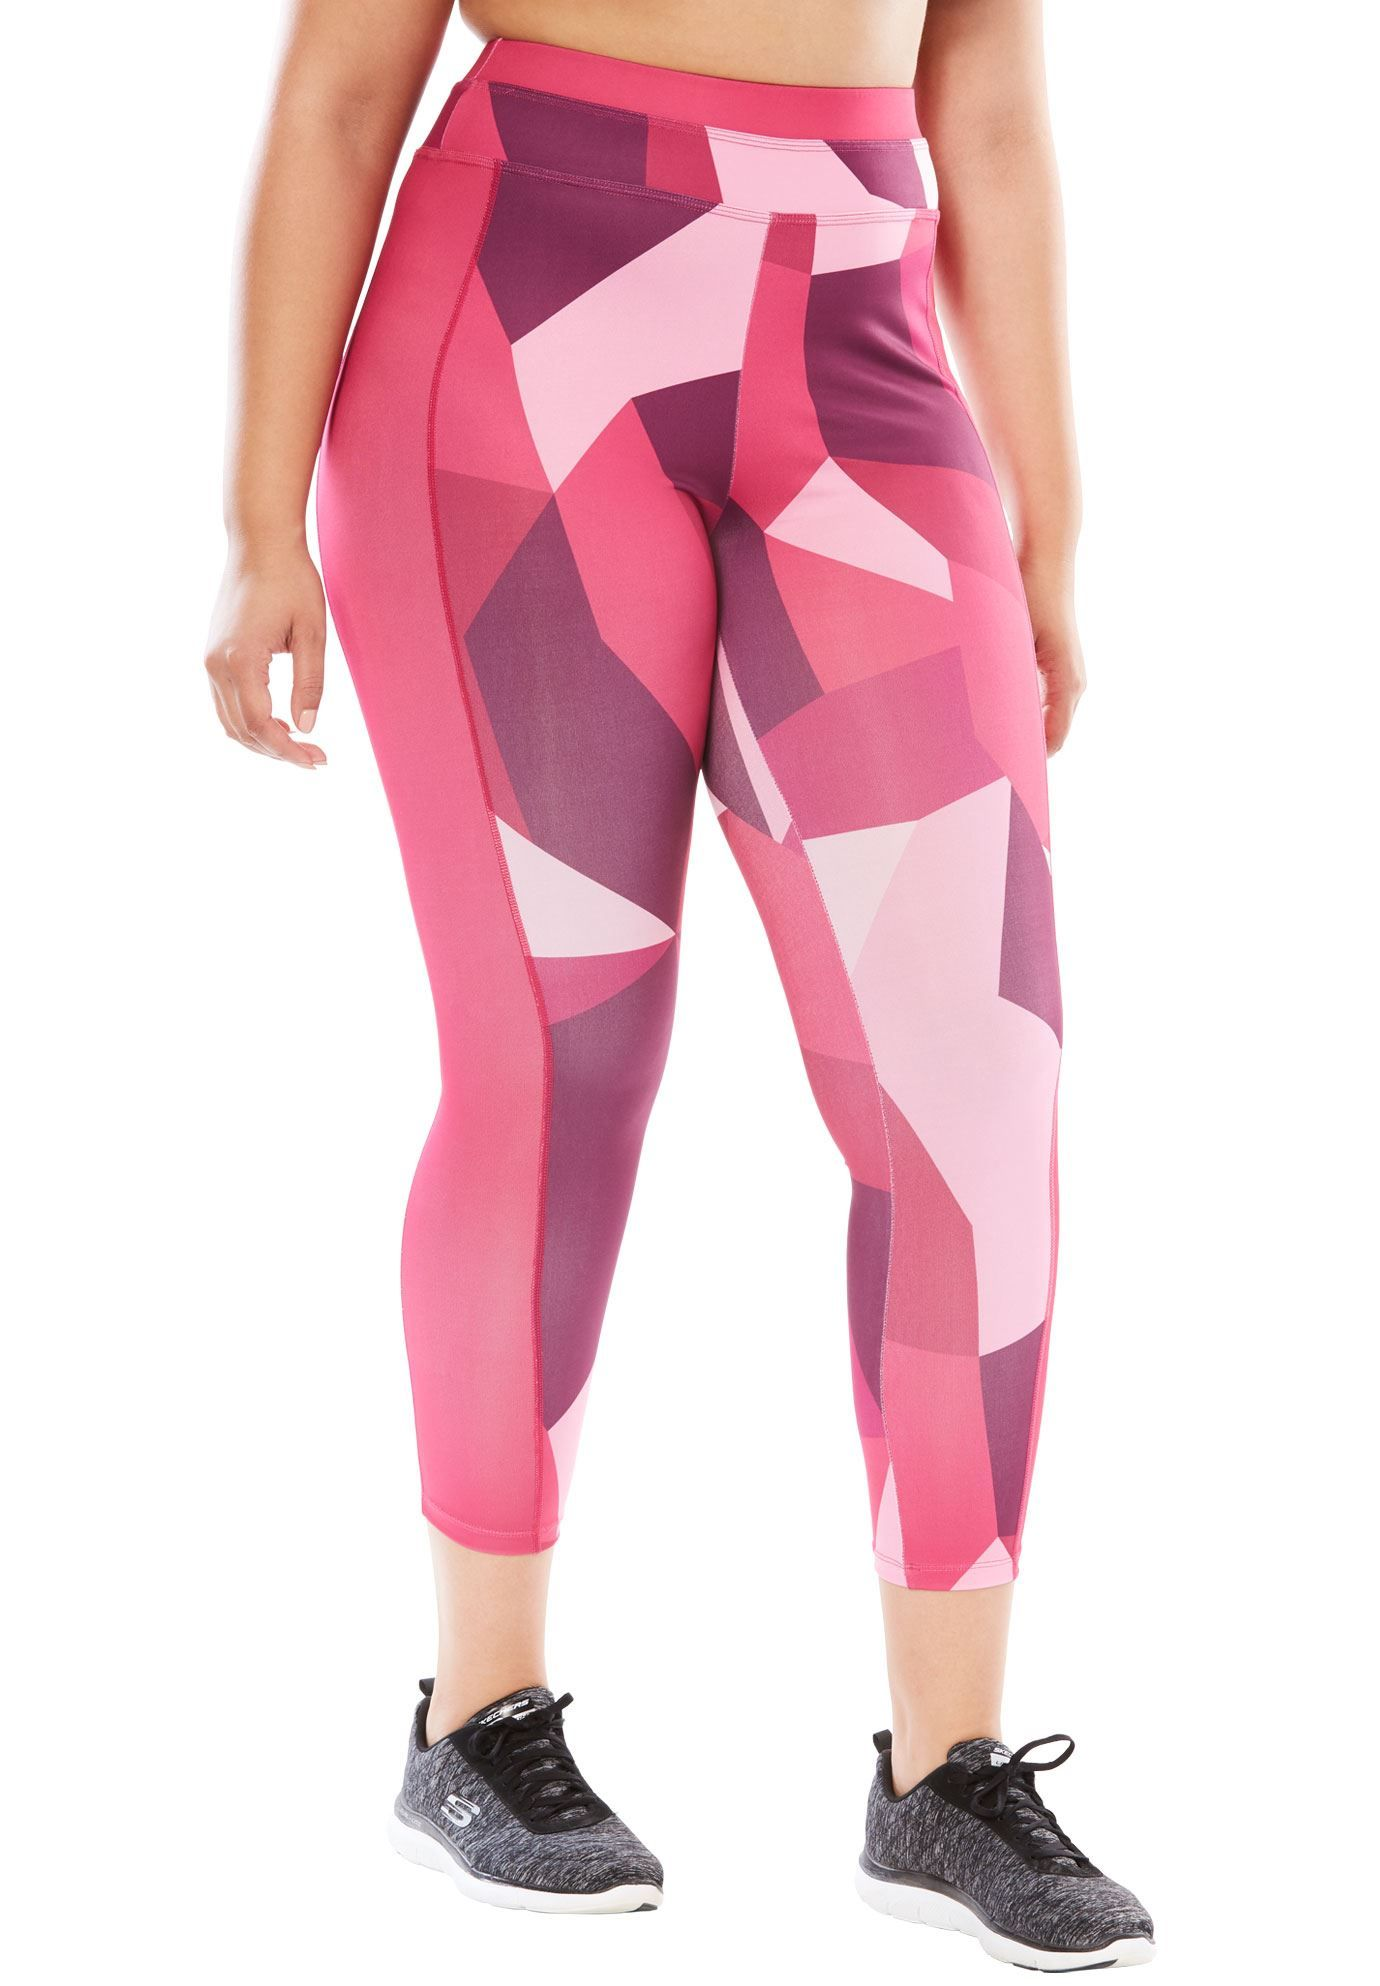 8466858cab3 Capri pants by FullBeauty SPORT - Women s Plus Size Clothing